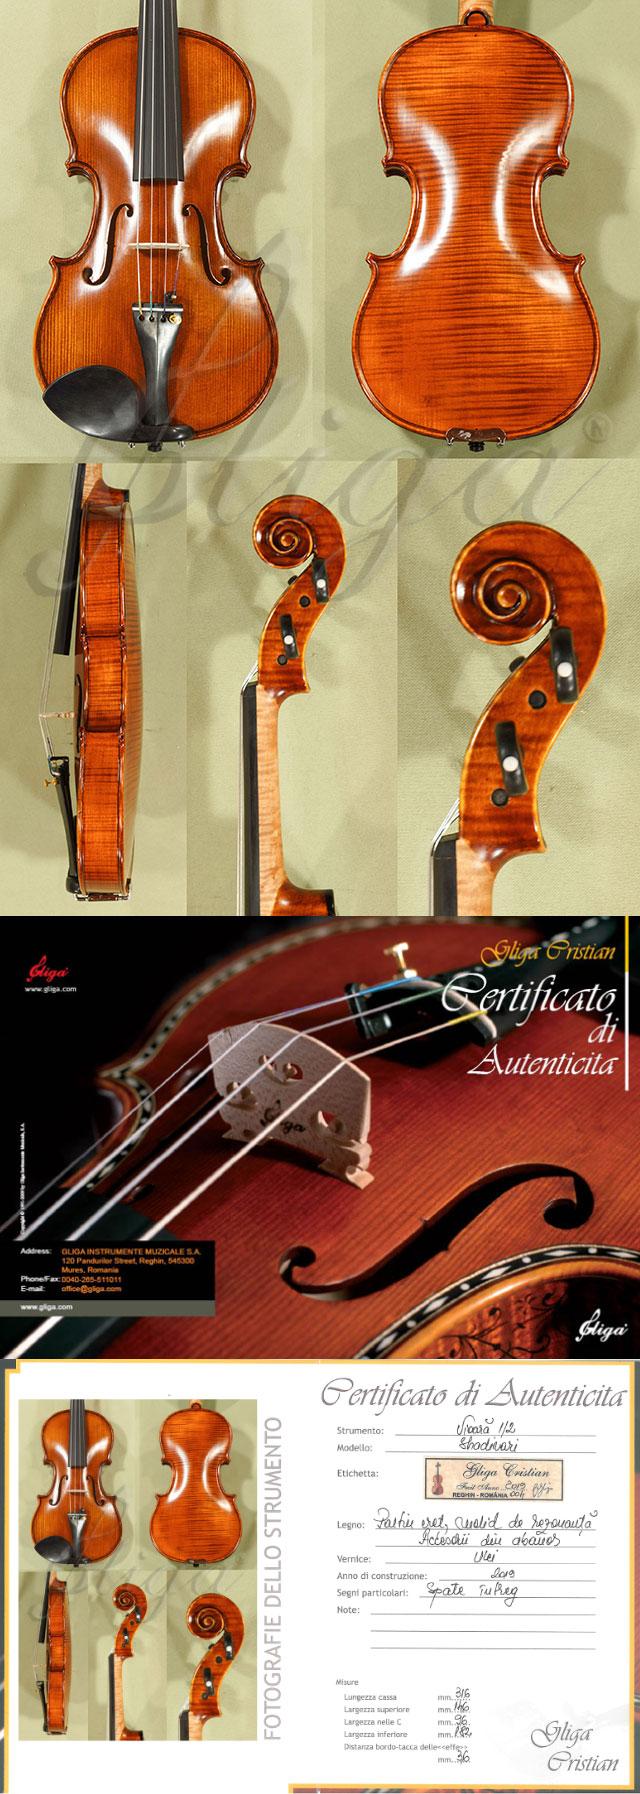 Antiqued 1/2 MAESTRO GLIGA One Piece Back Violin